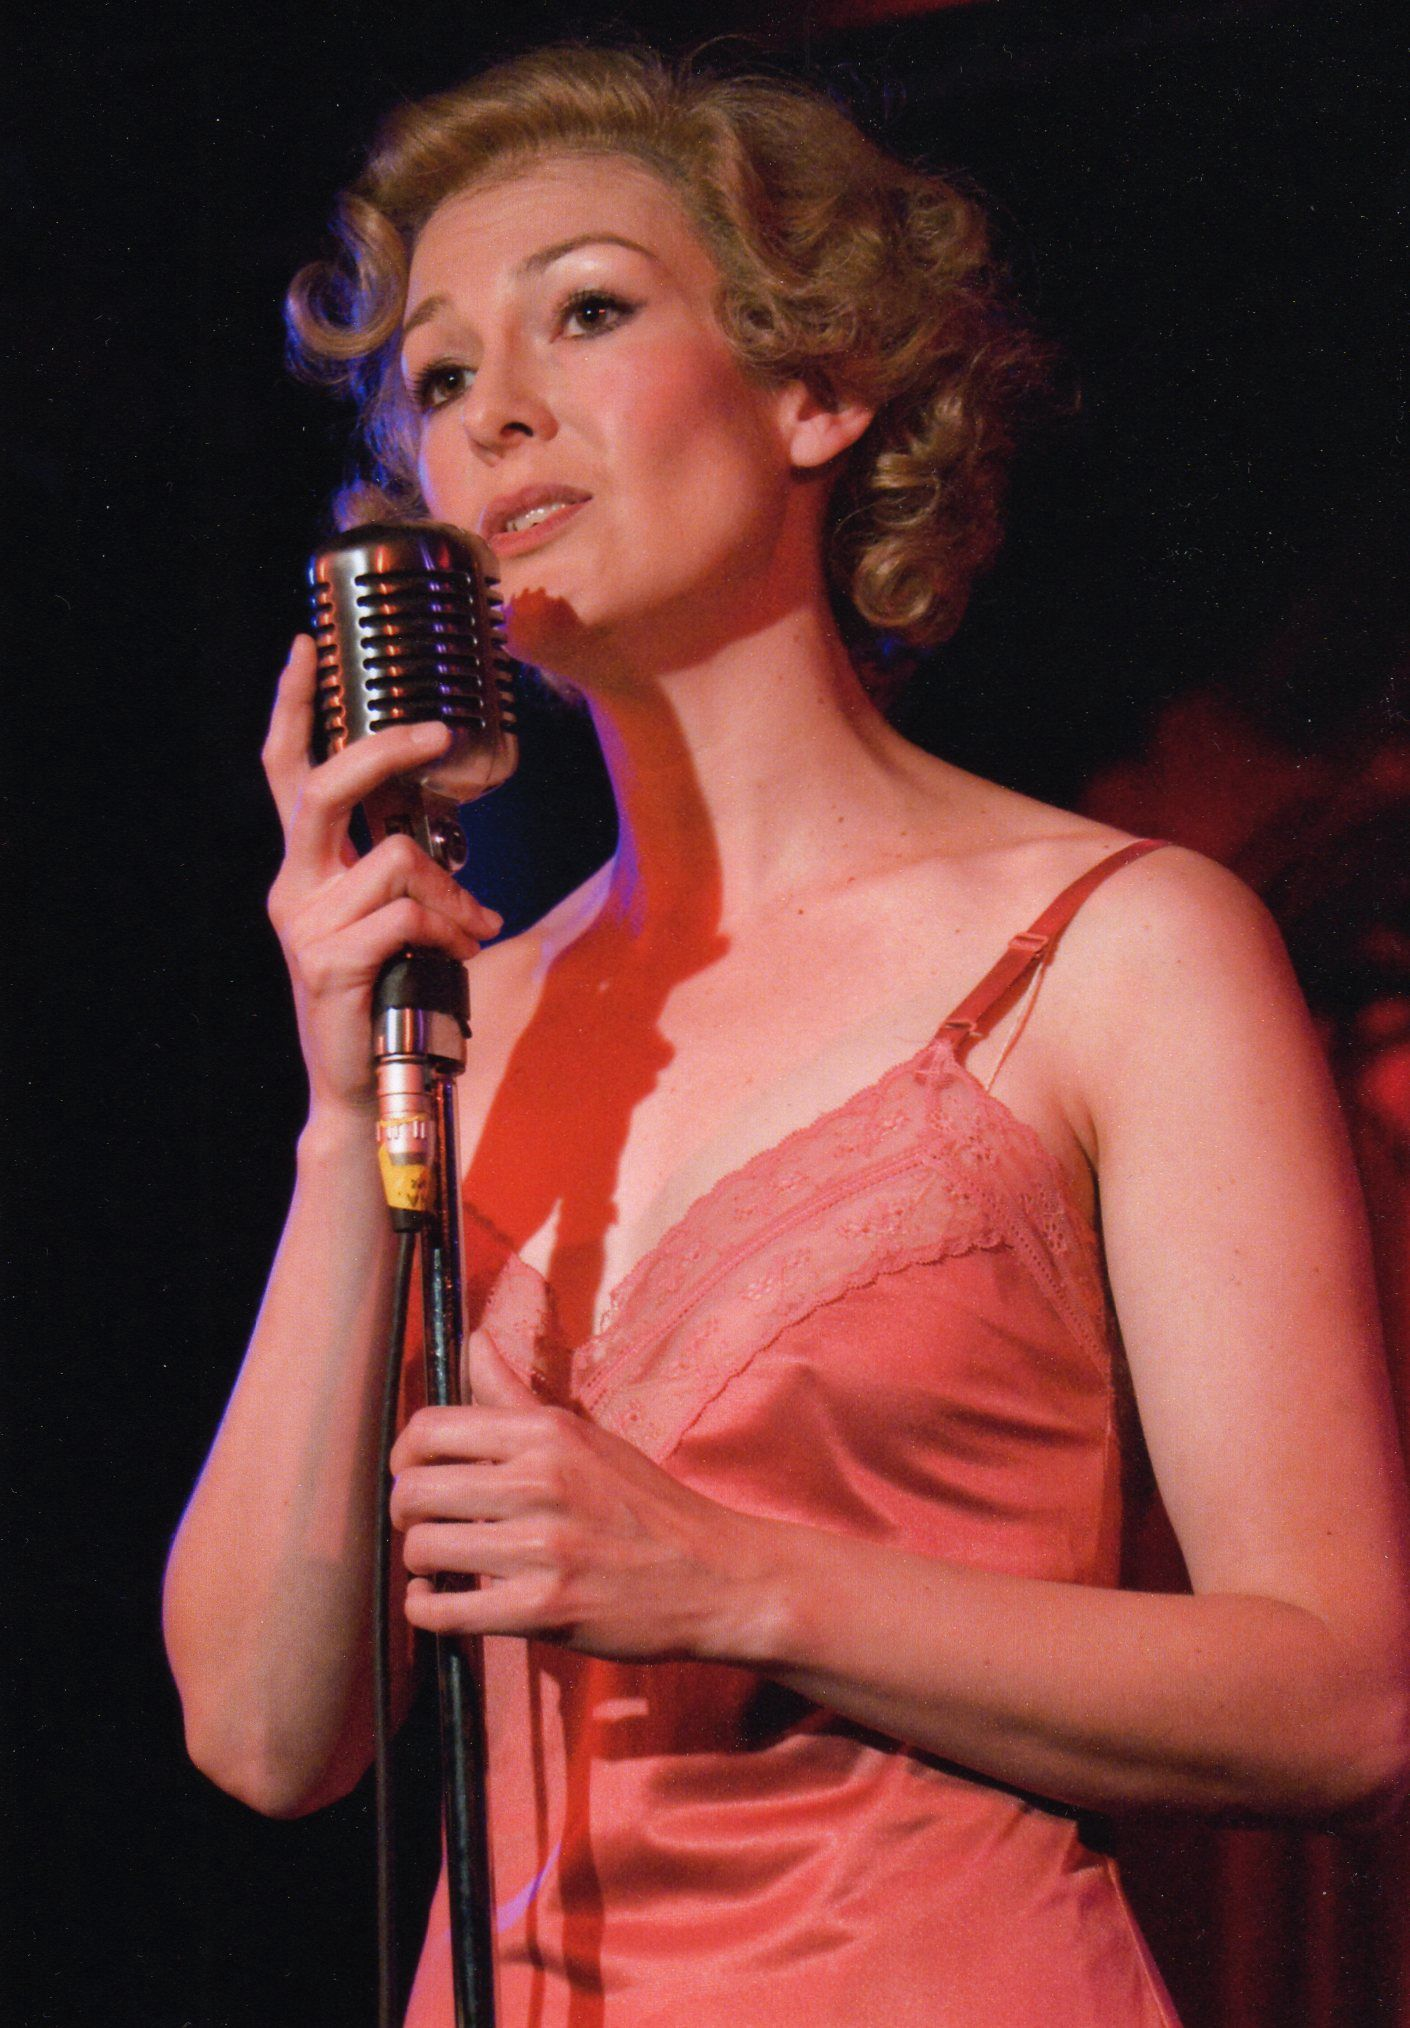 Marketa Sidkova